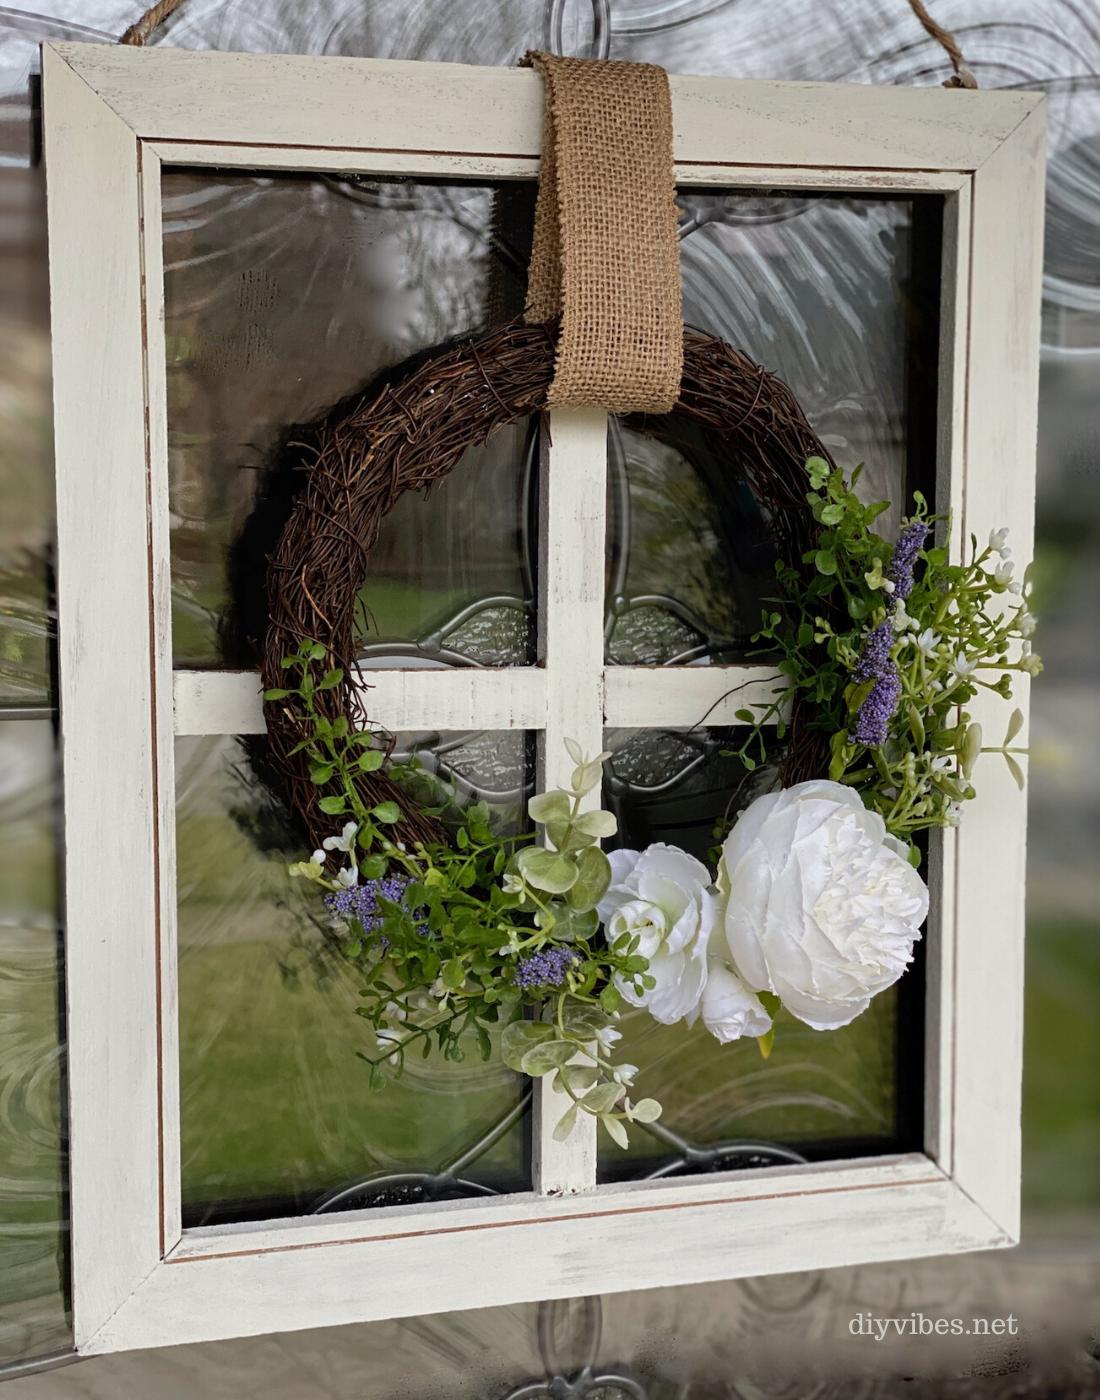 Spring Floral Wreath Spring Grapevine Grapevine Decor Door Decor Floral Grapevine Spring Wreath- Floral Wreath Spring Front Door